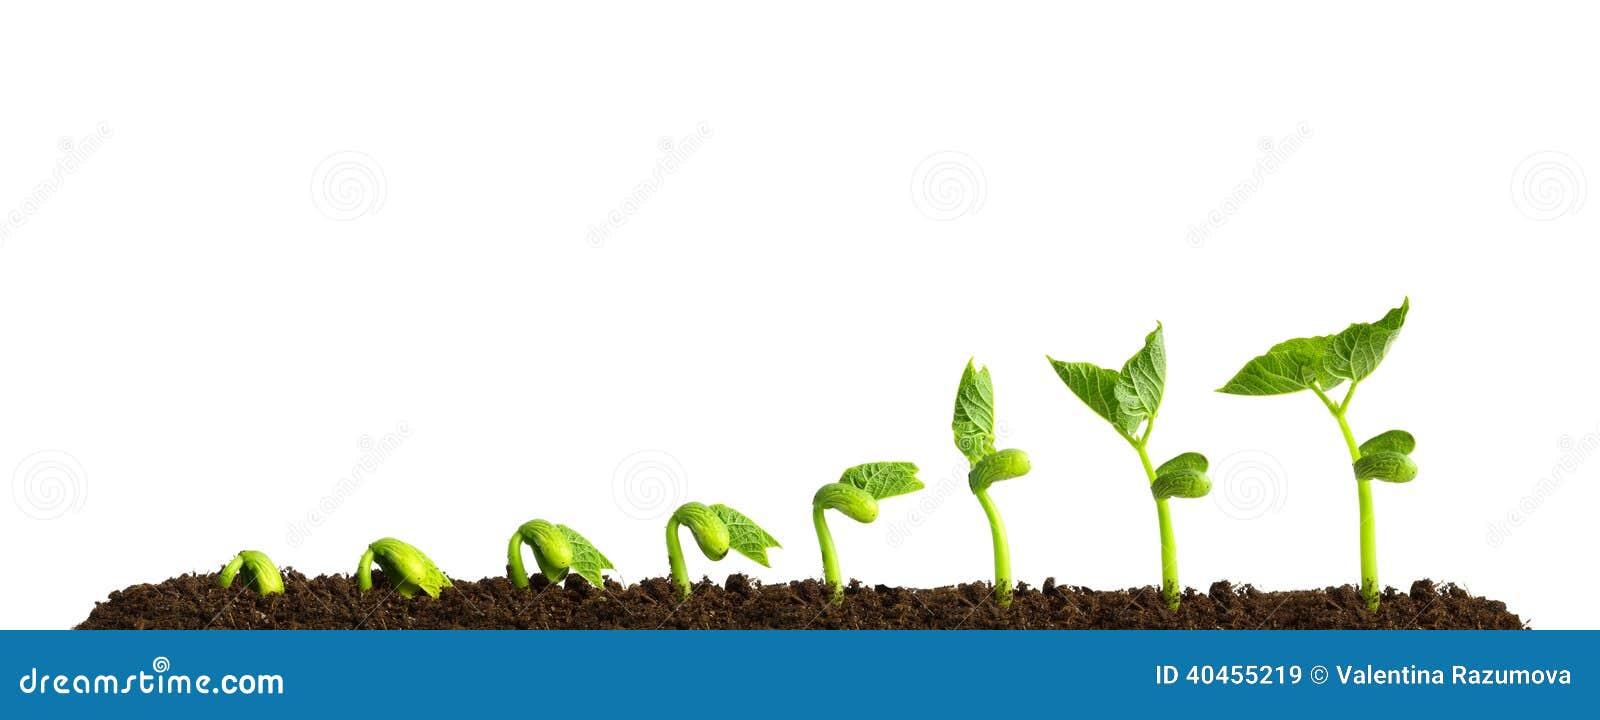 Planta crescente no solo